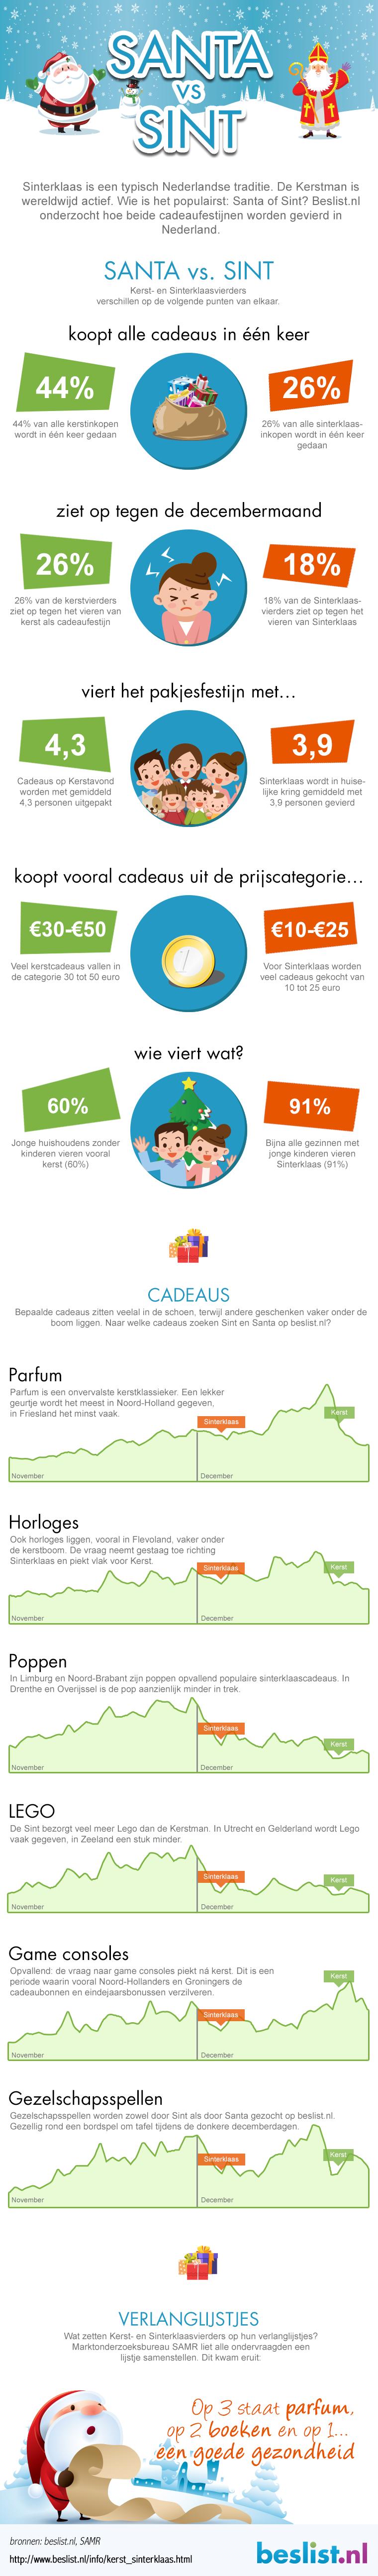 Infographic: Santa vs Sint